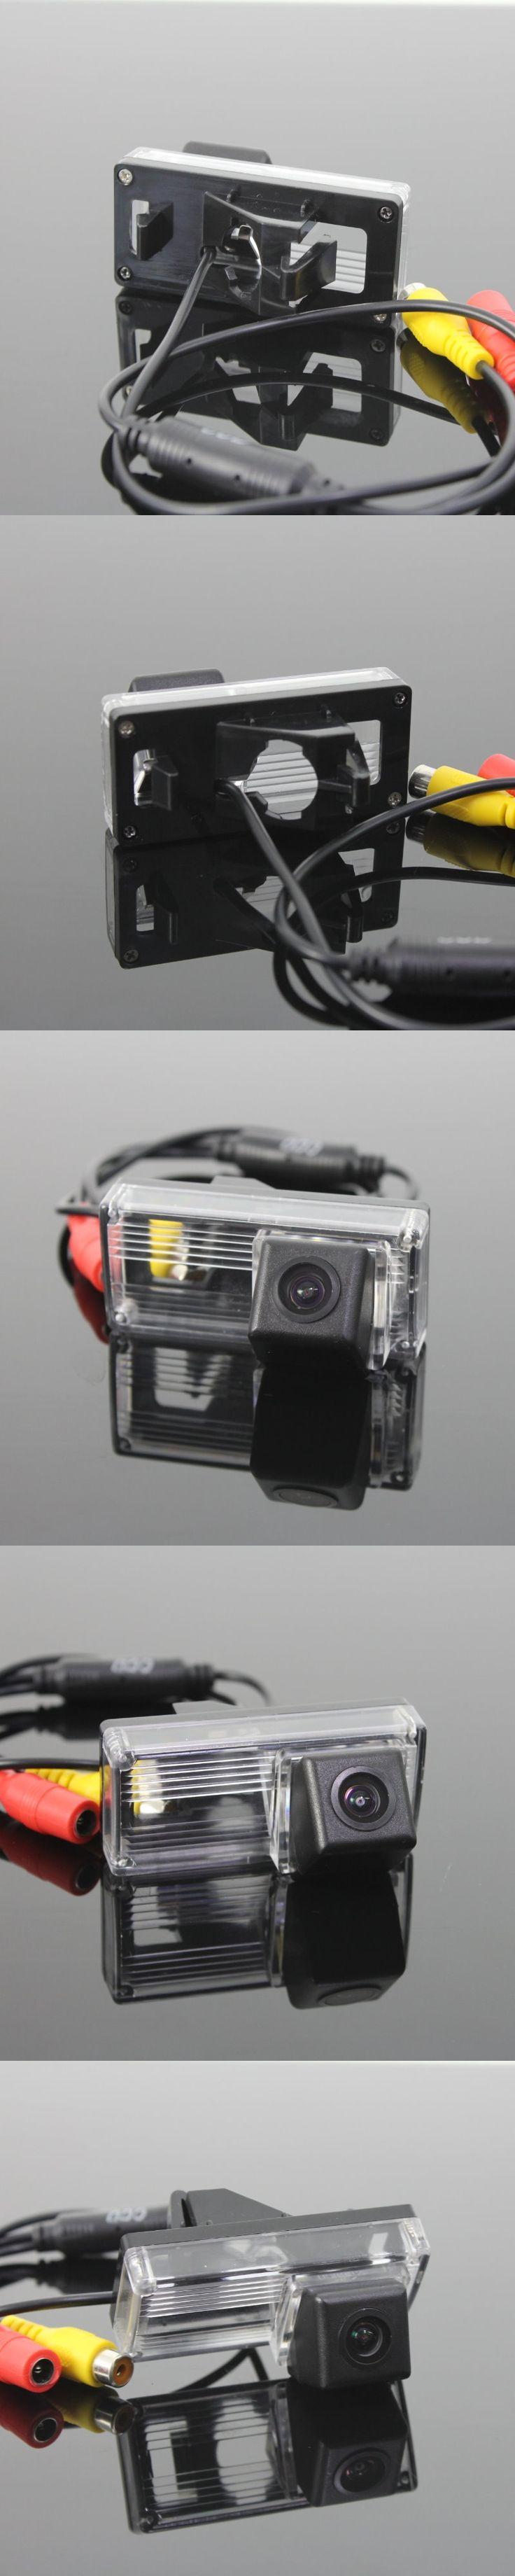 Reversing Back up Camera / FOR Lexus GX 470 GX470 / Car Parking Camera / Rear View Camera / HD CCD Night Vision